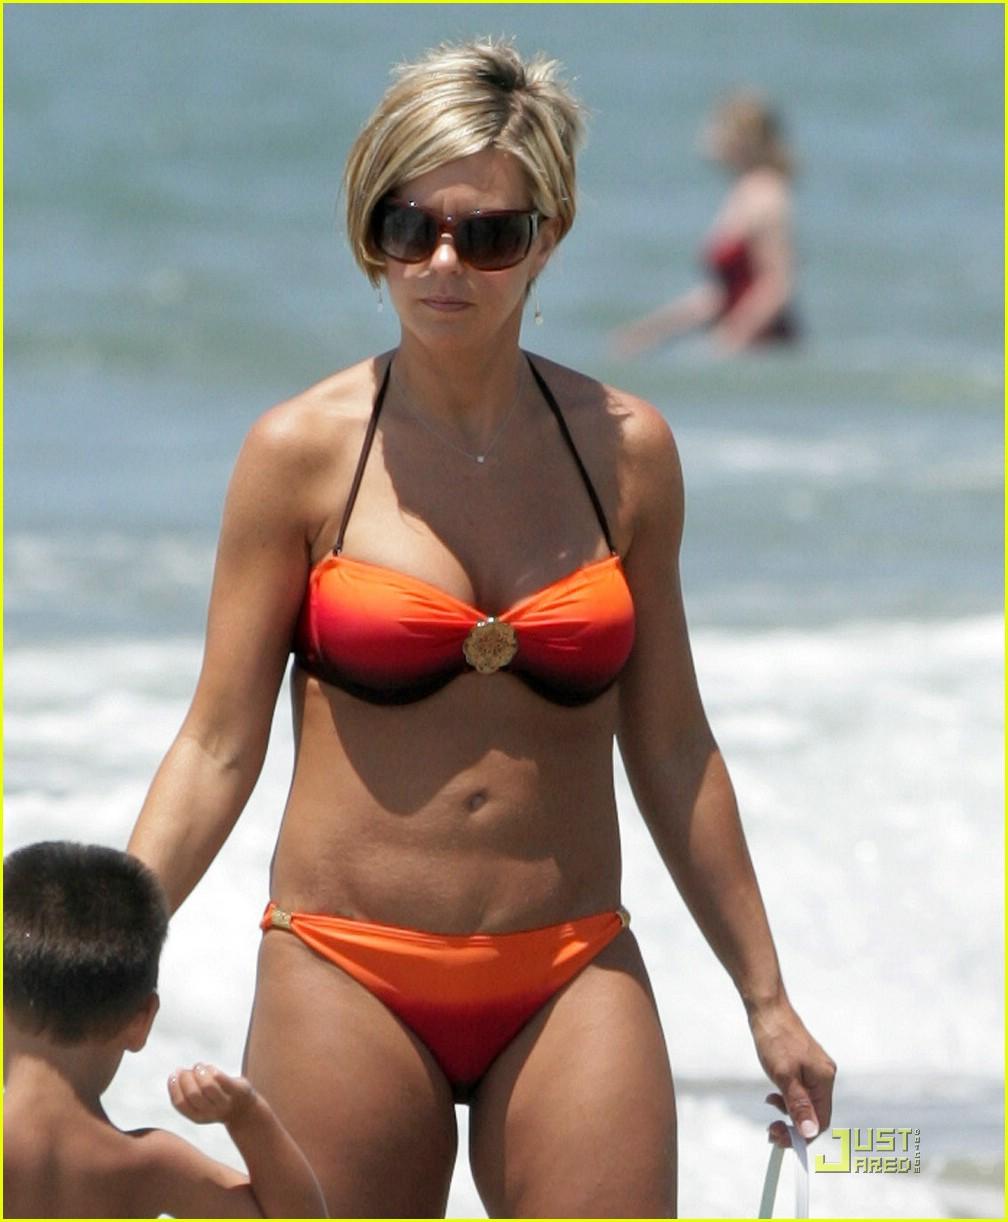 Kate gosselin is a bikini mama photo bikini celebrity kate austin bikini  jpg 1008x1222 Kate austin